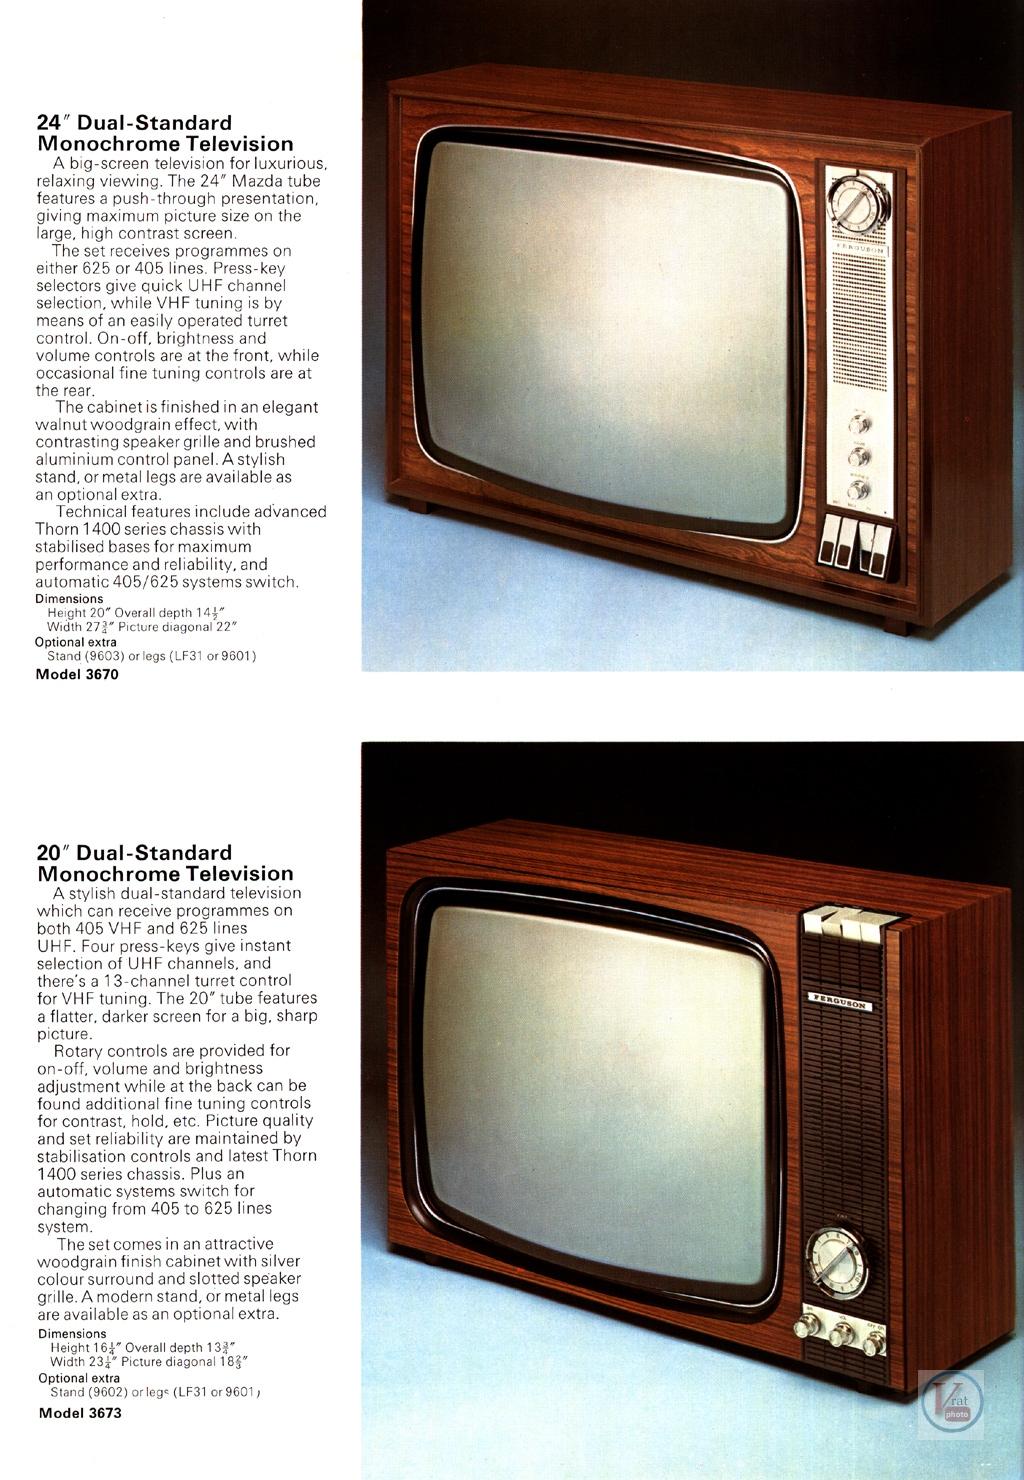 1973 Ferguson Brochure 114